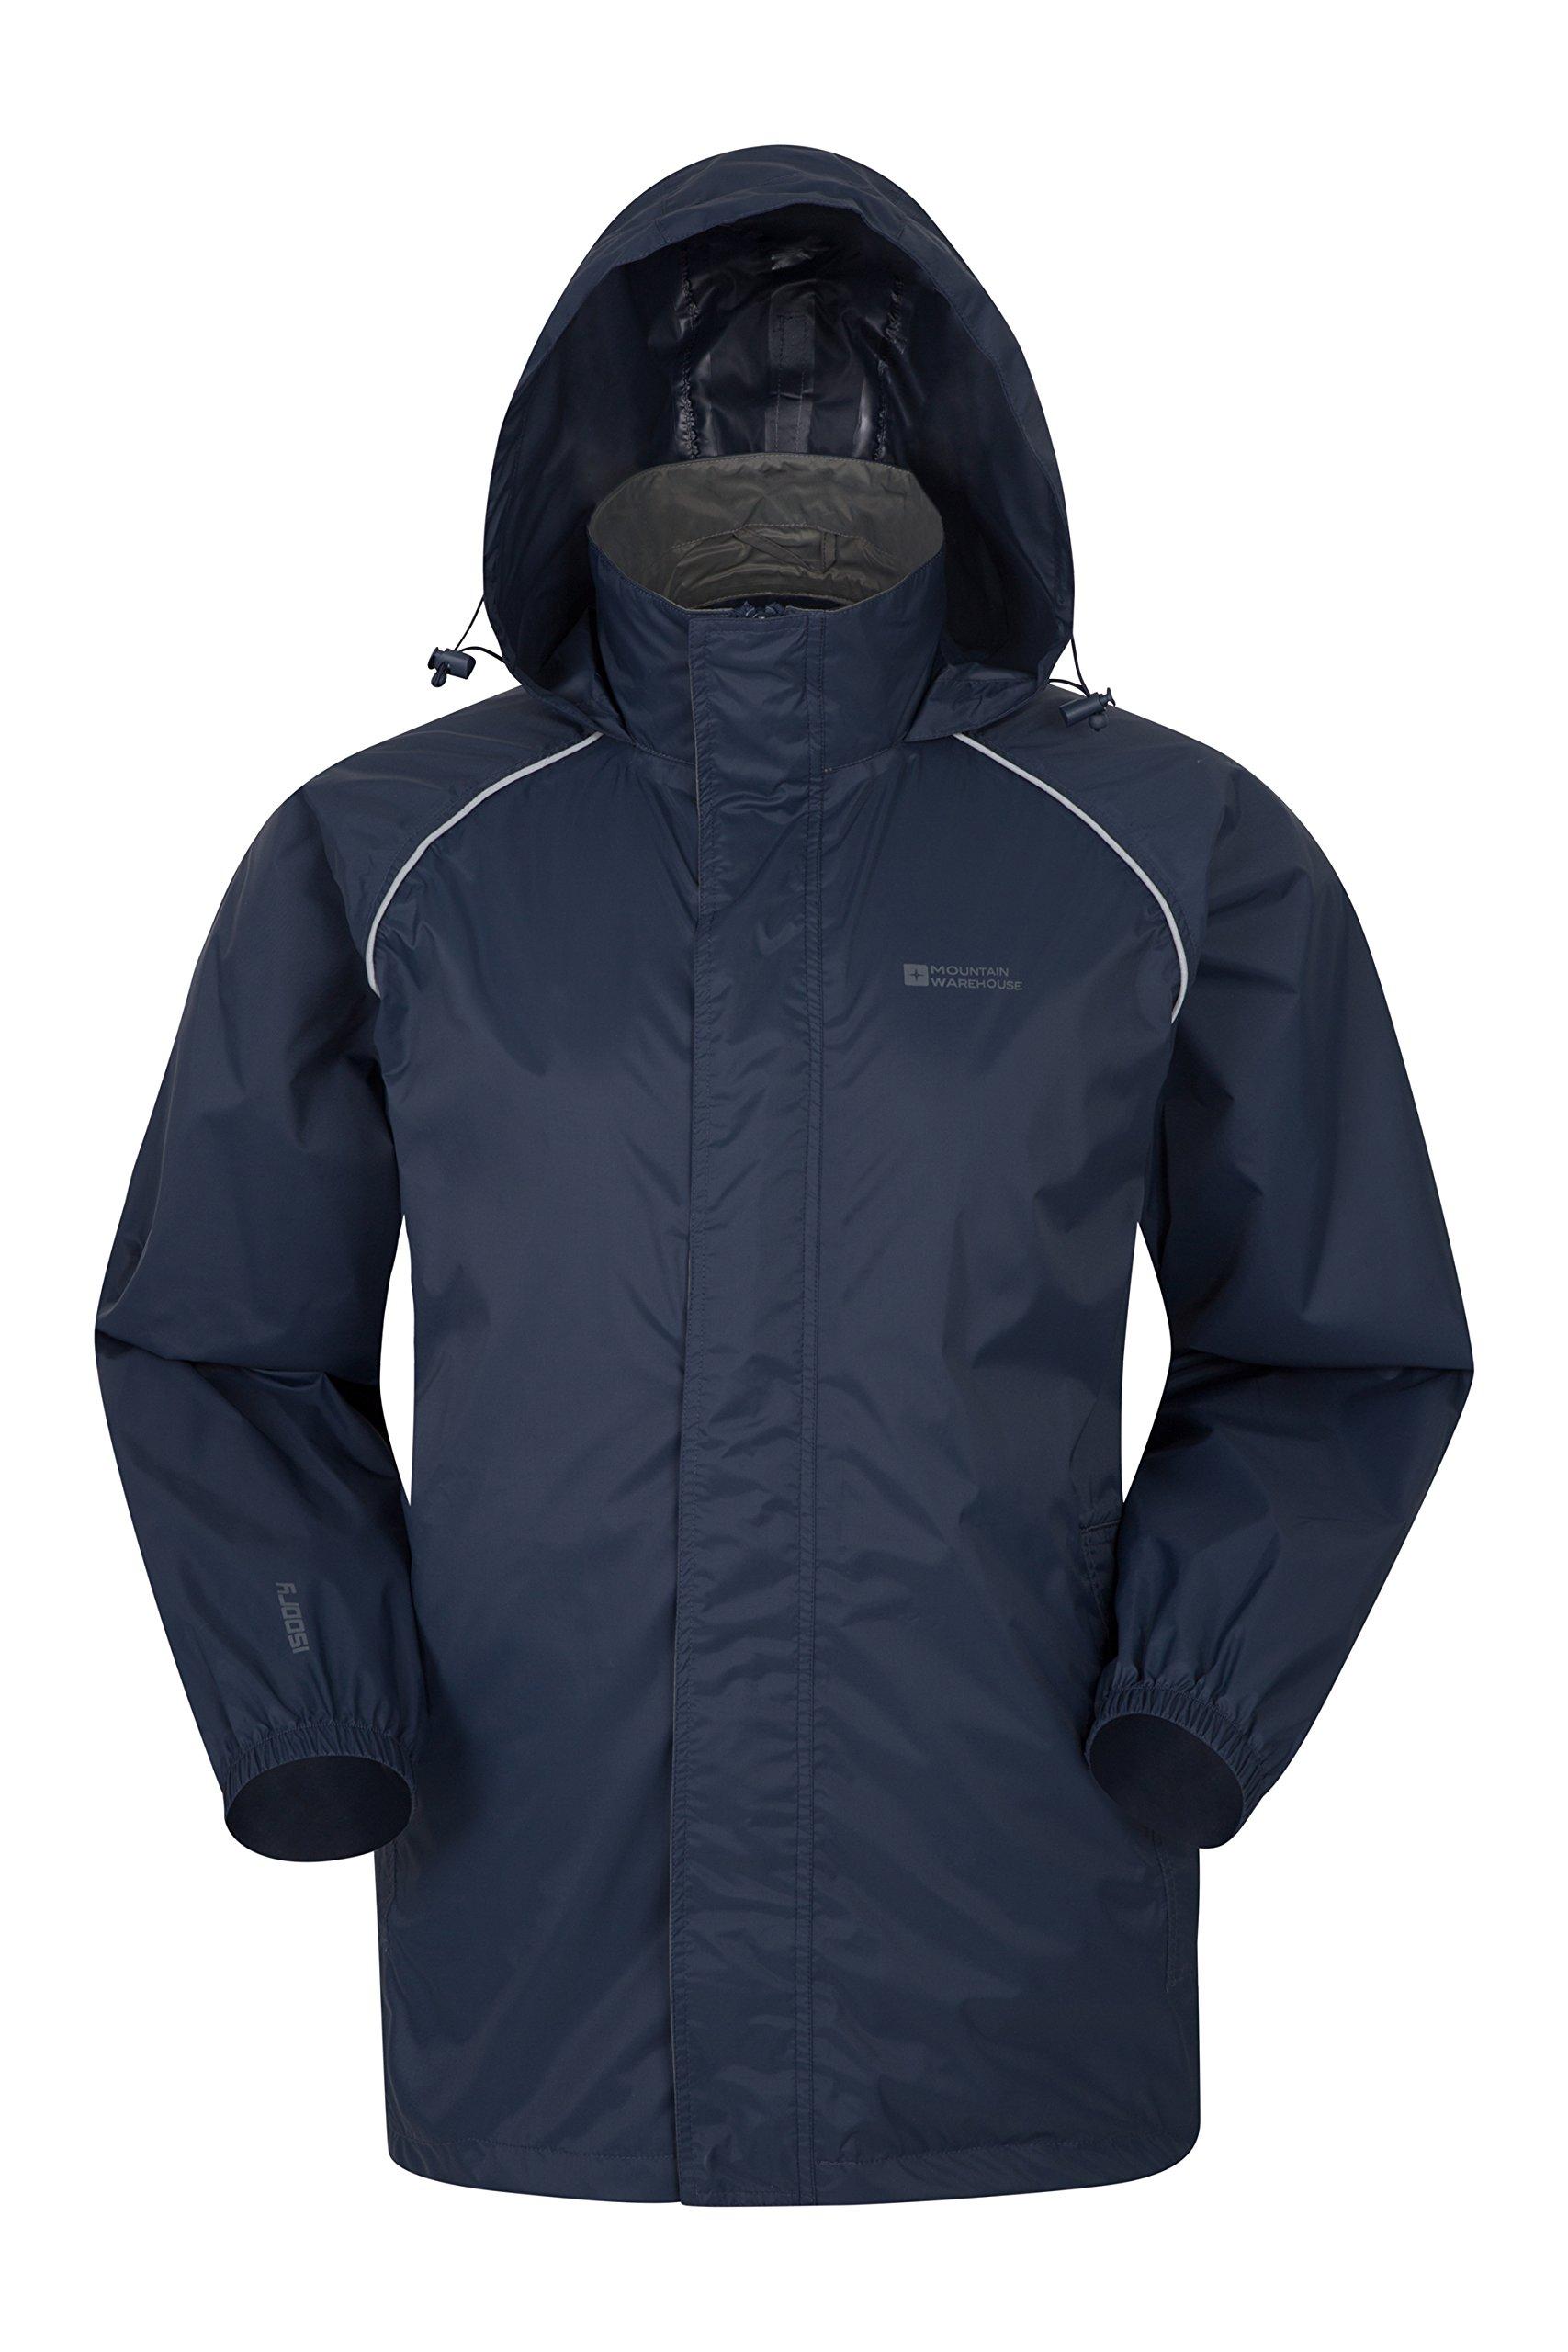 Mountain Warehouse Pakka Mens Packable Jacket -Waterproof Summer Coat Navy Medium